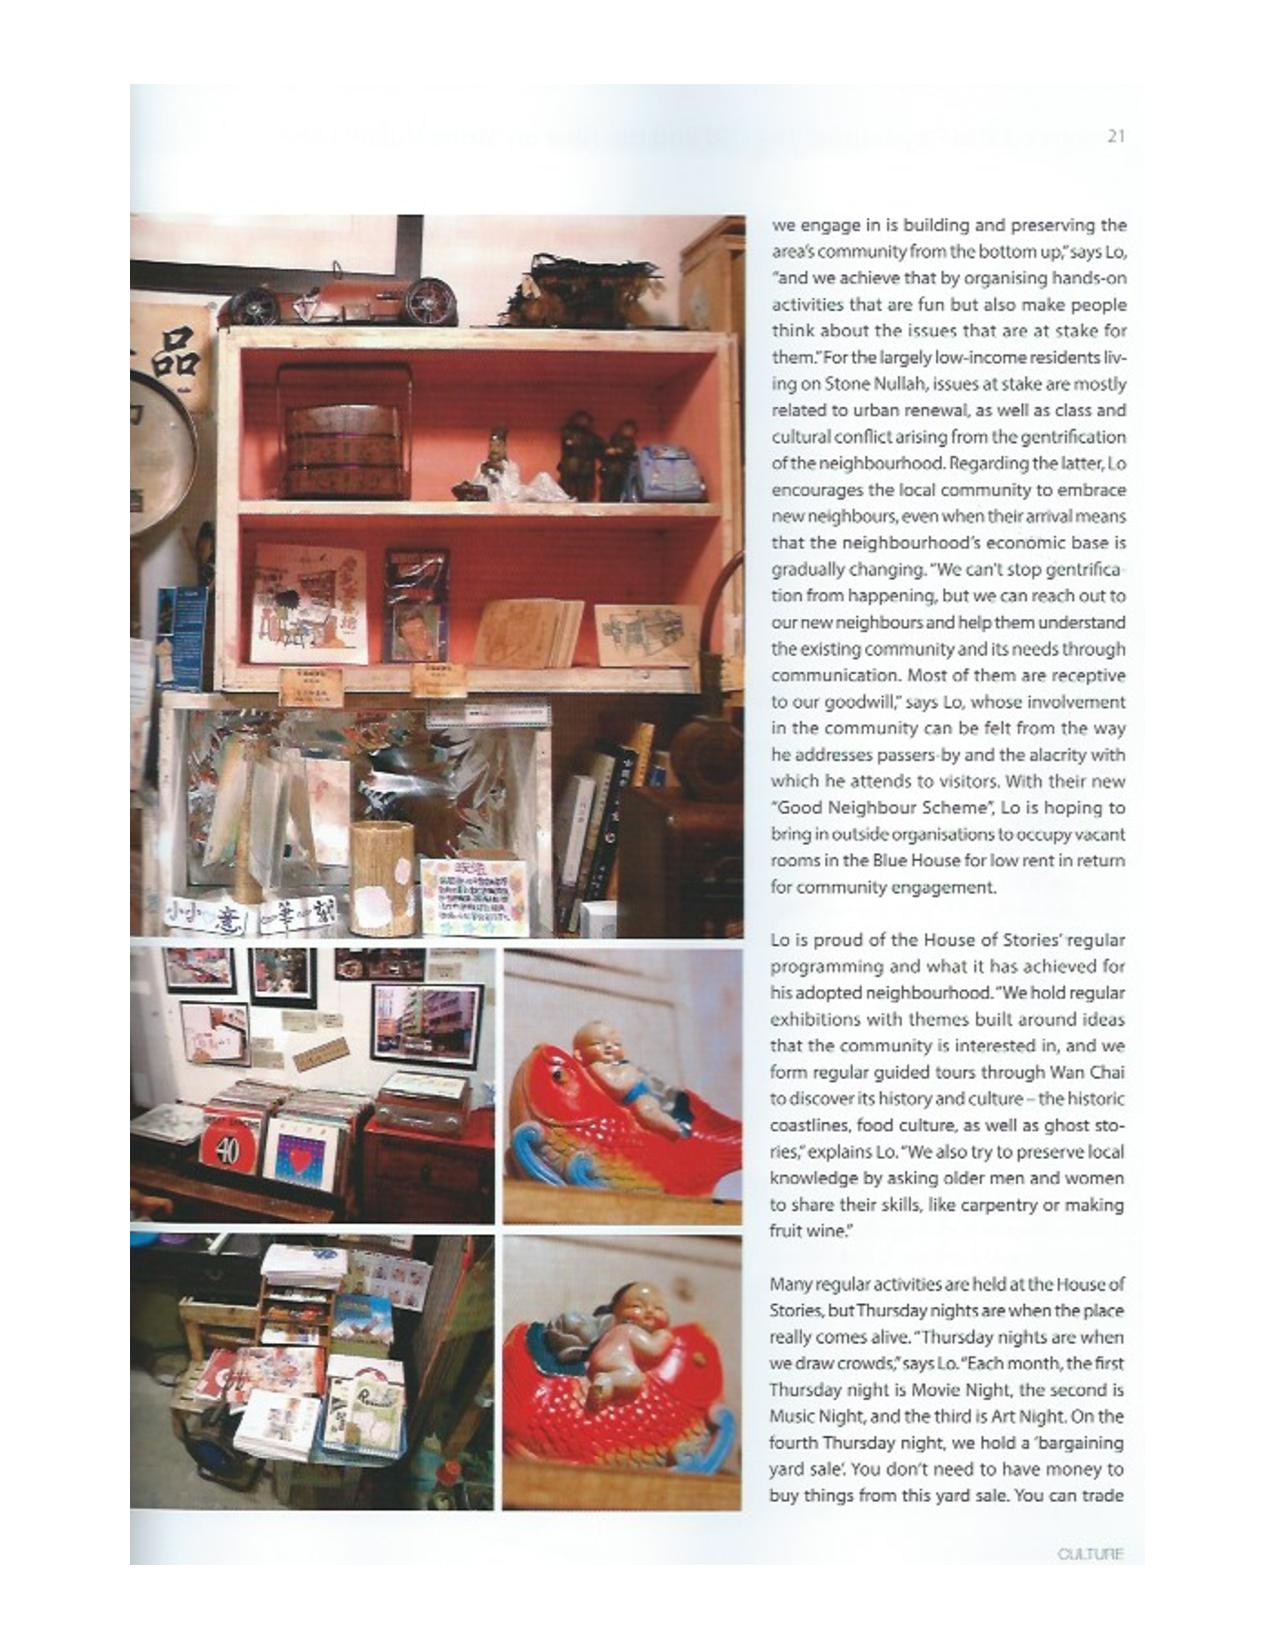 Stone Nullah Lane_CULTURE mag-page-003.jpg